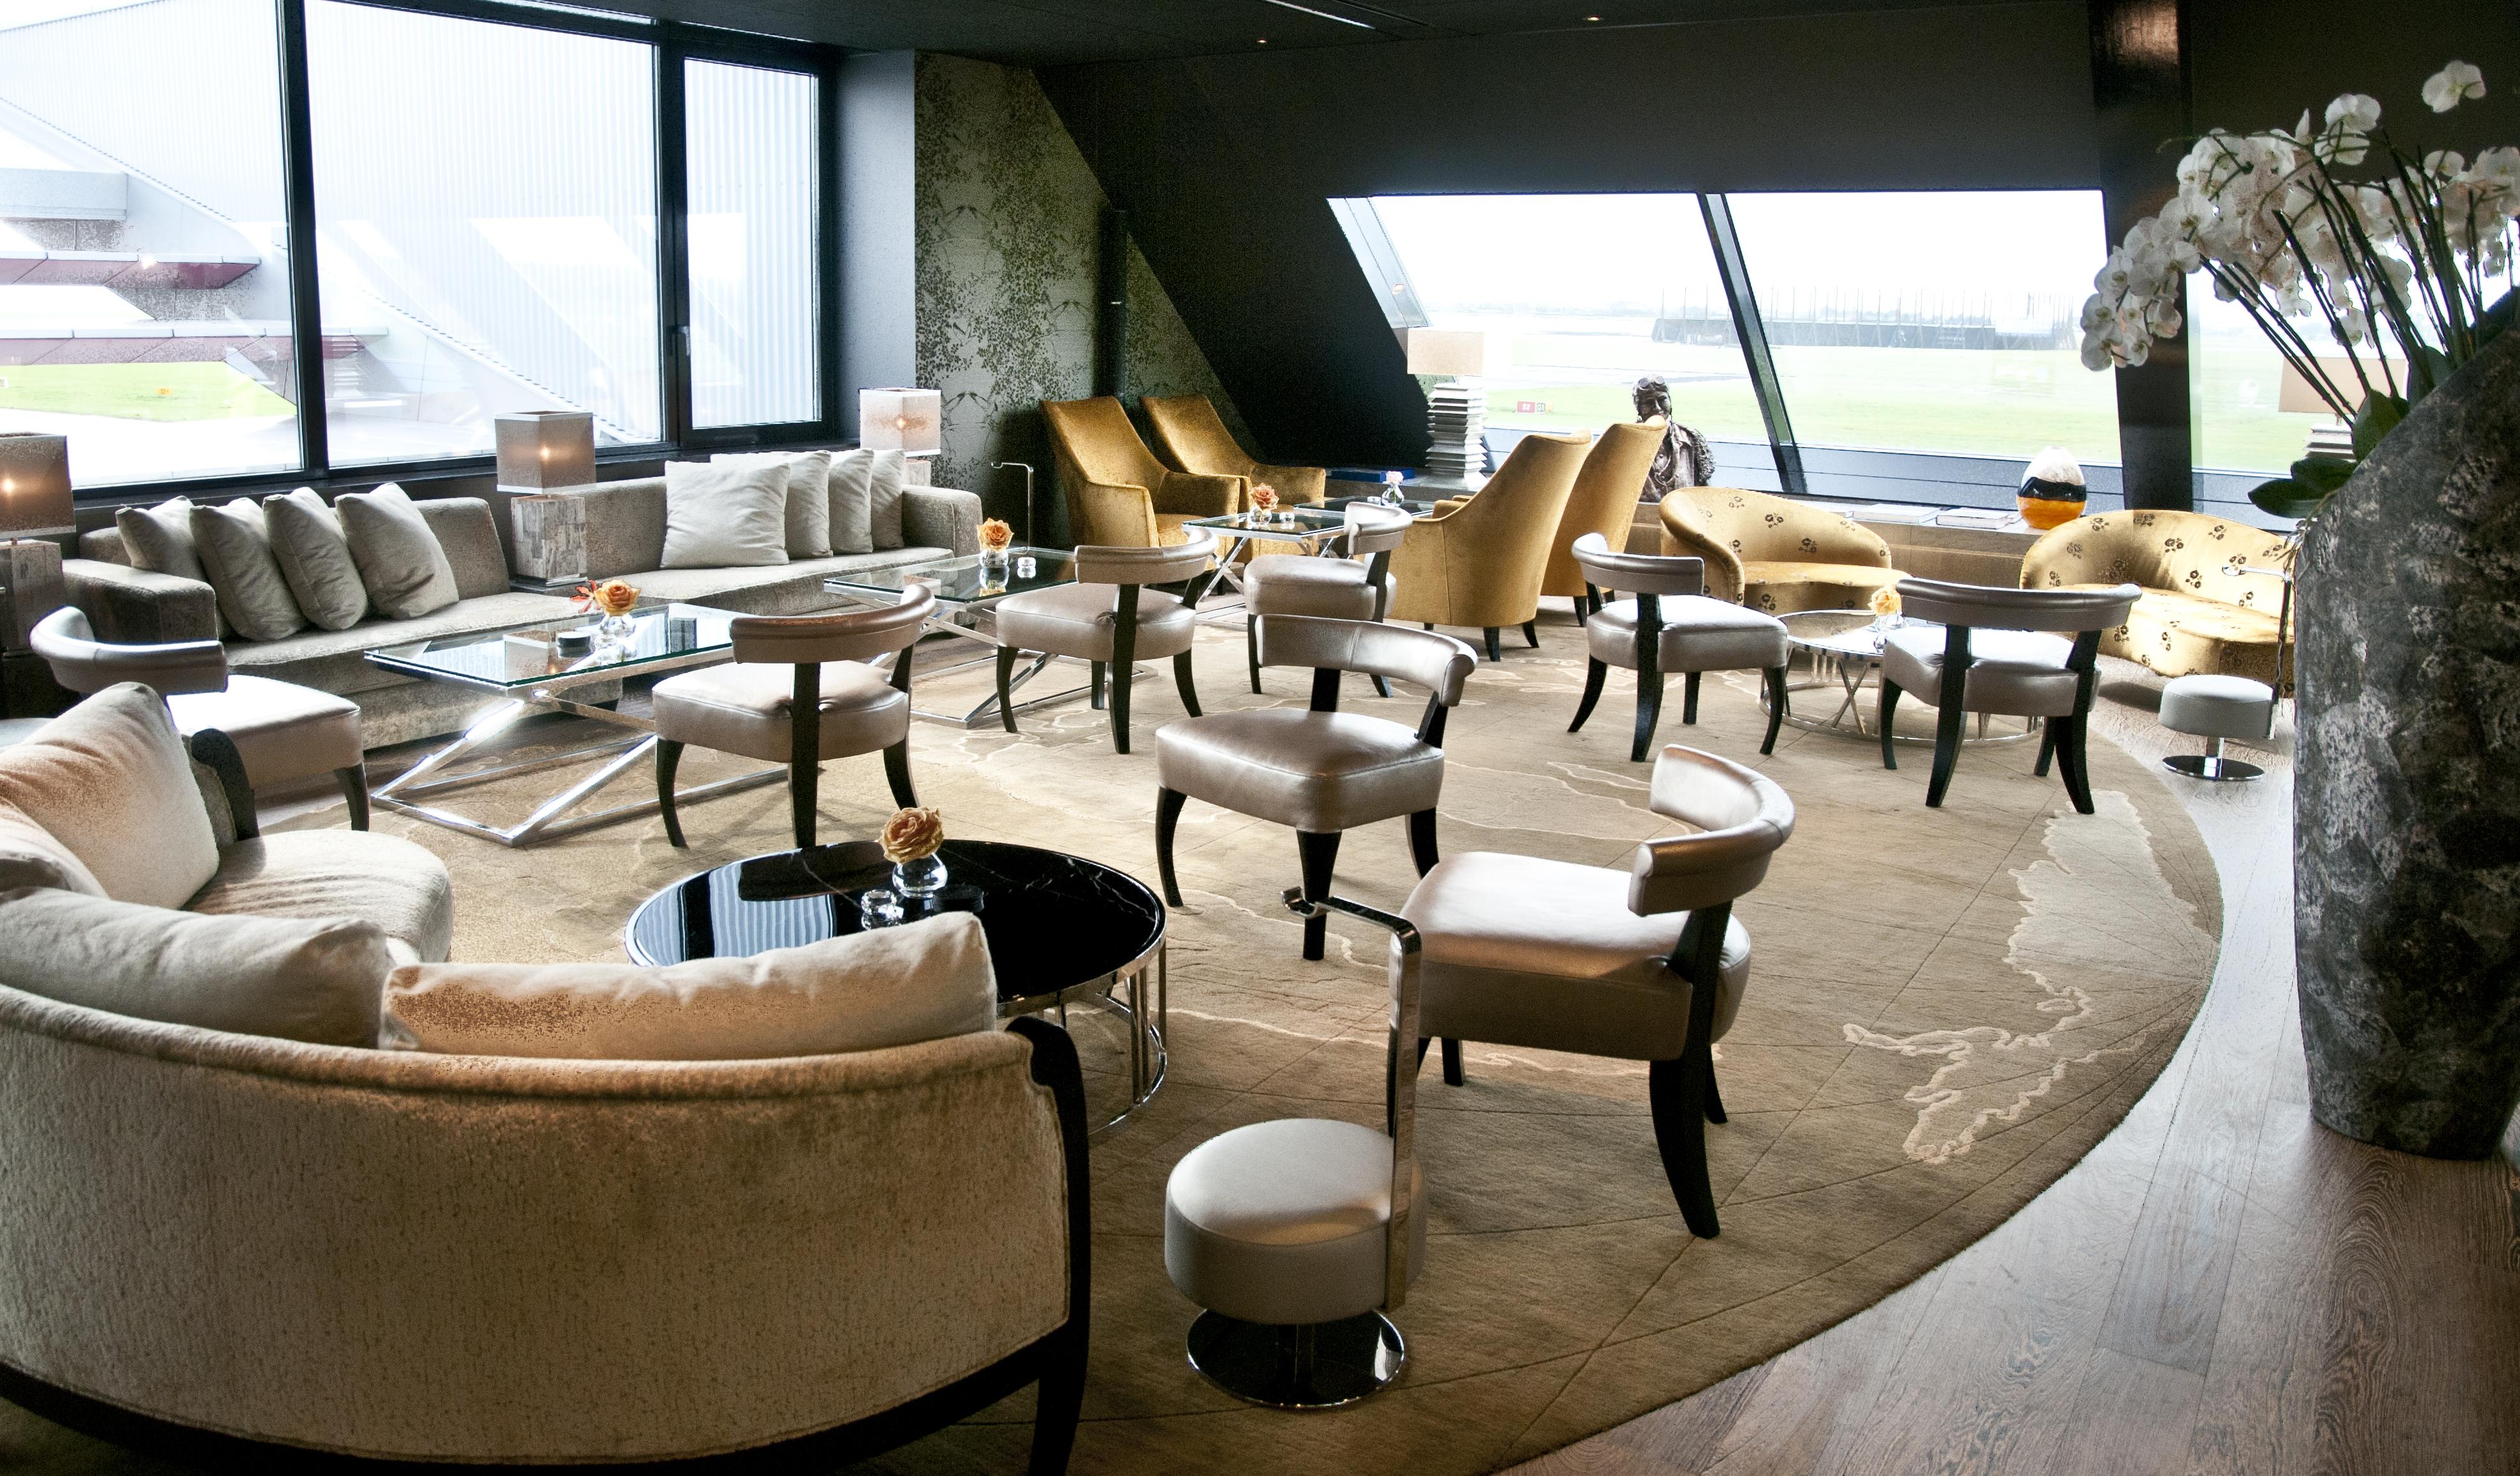 Home Wandbekleding bedrijven Summum Private Jet Lounge: www.mauricedeman.nl/portfolio-view/summum-private-jet-lounge